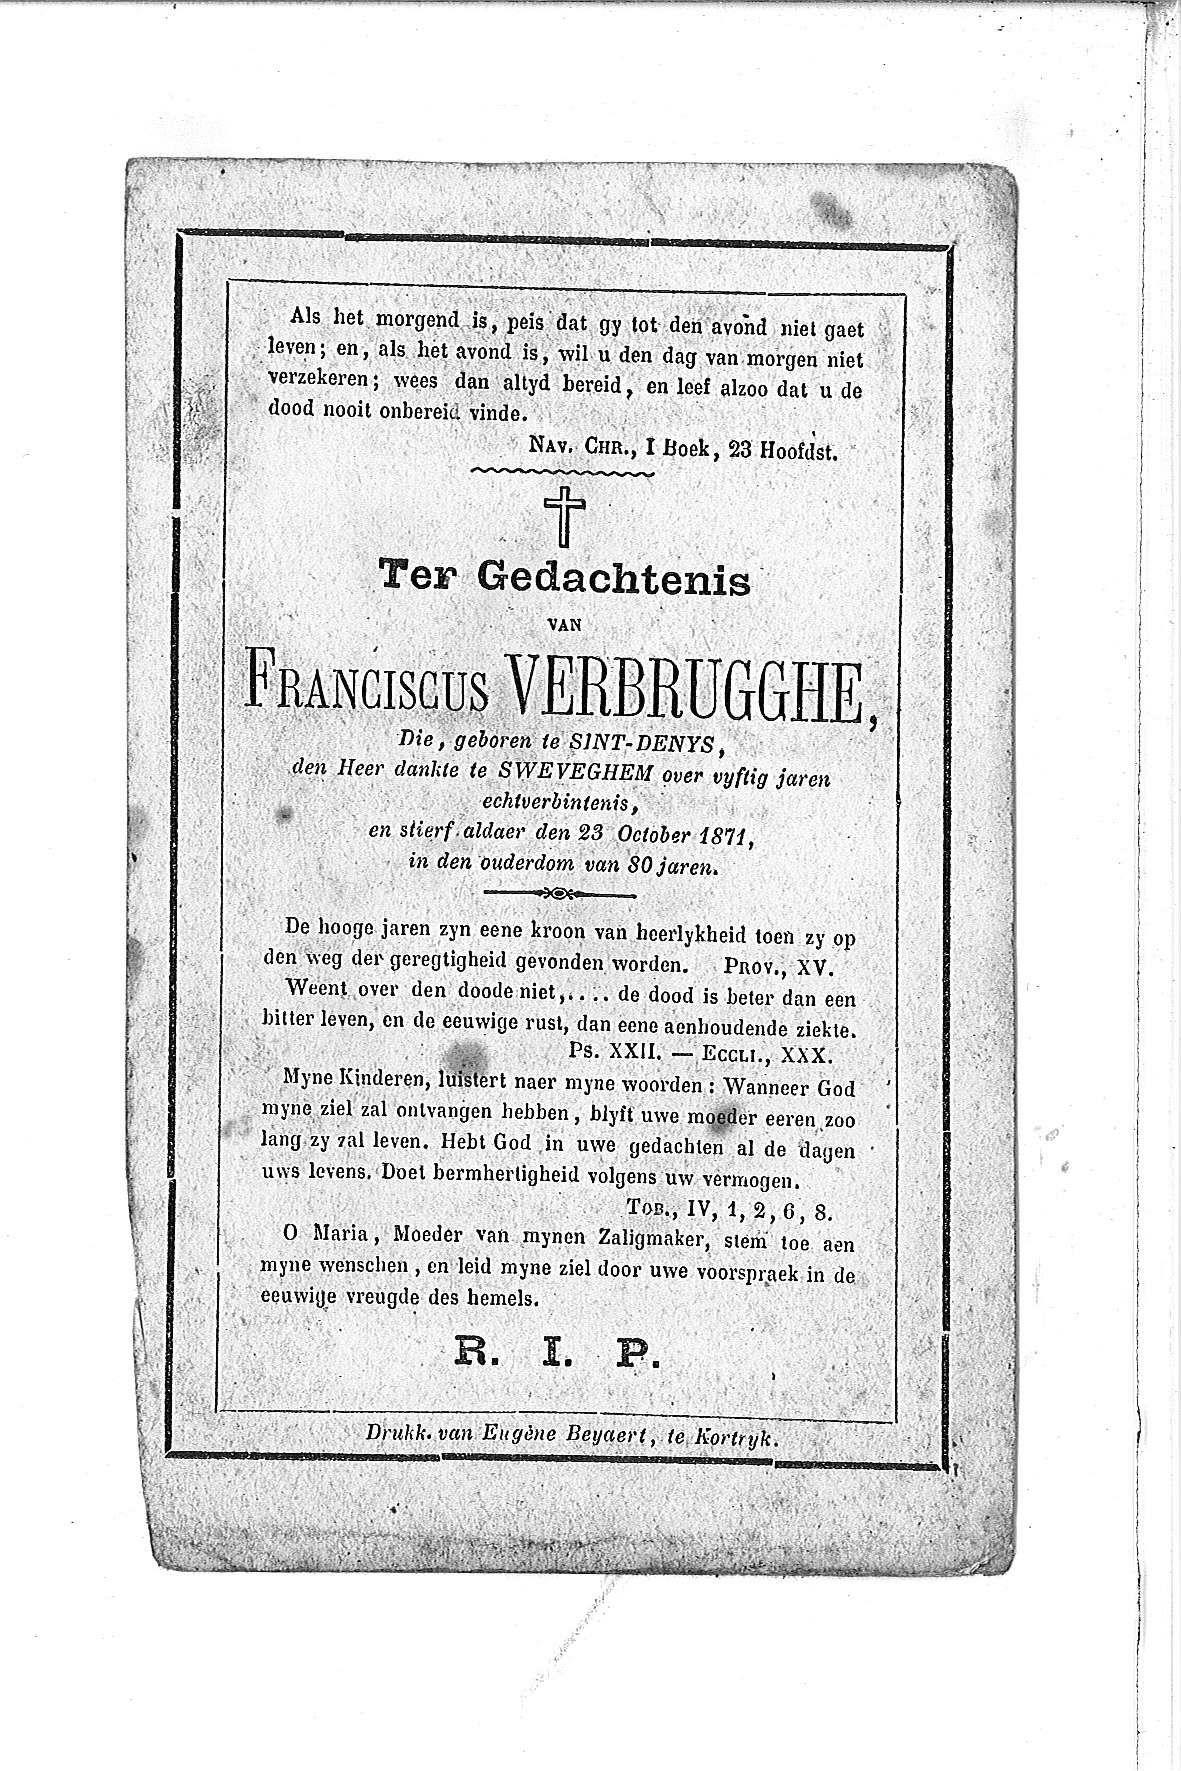 Franciscus(1871)20100720084332_00034.jpg